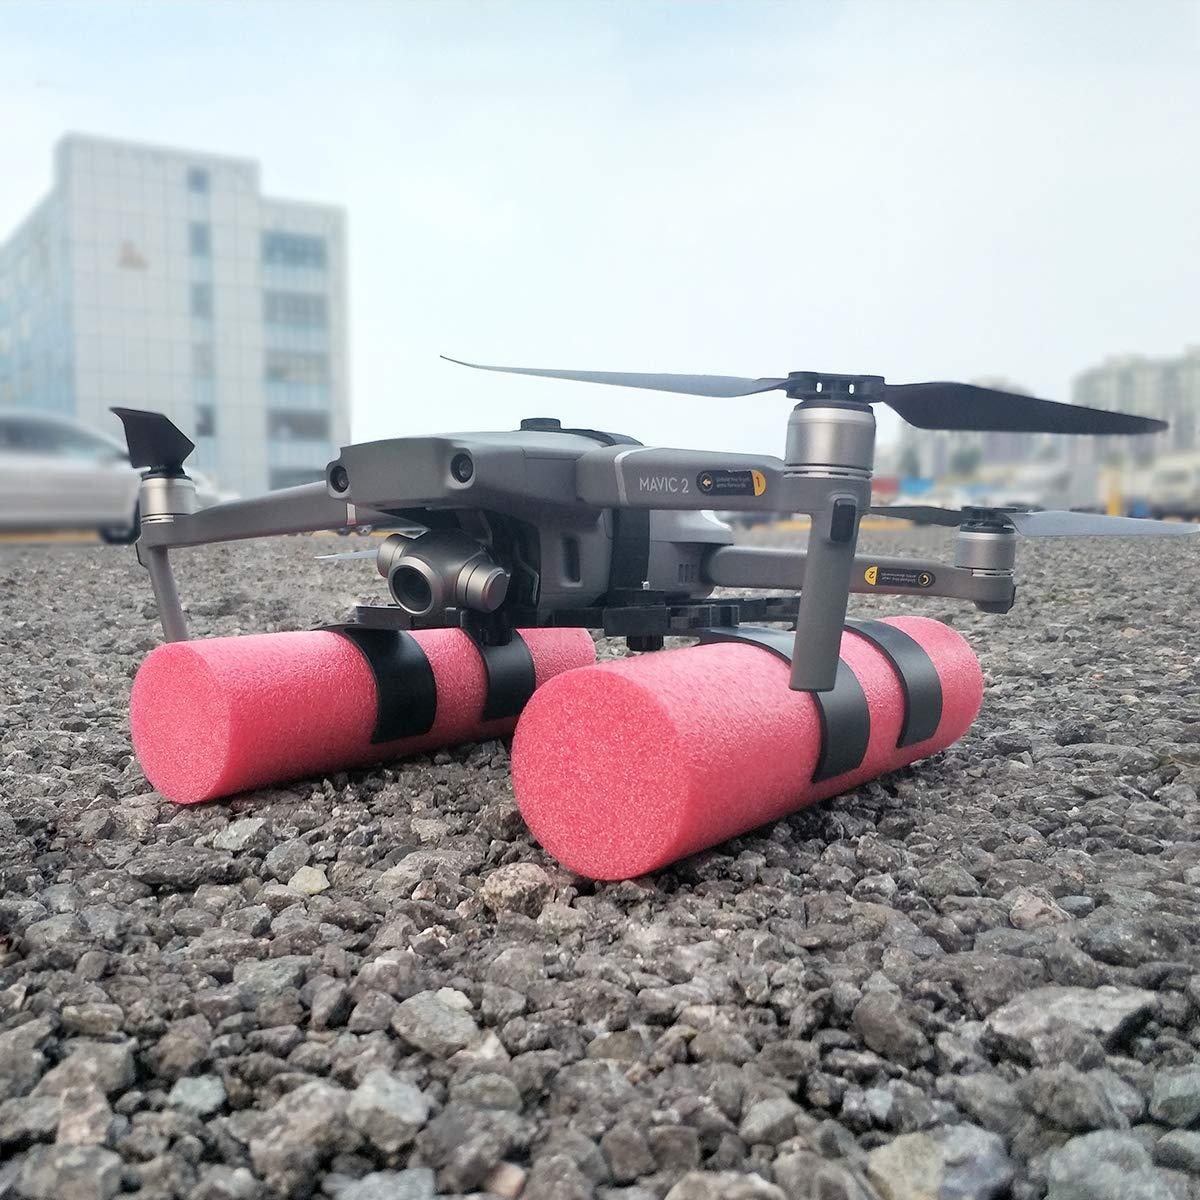 Mavic 2 Water Landing Leg,STARTRC Damping Landing Gear Training Kit Floating Holder for DJI Mavic 2 Pro/Zoom by STARTRC (Image #4)